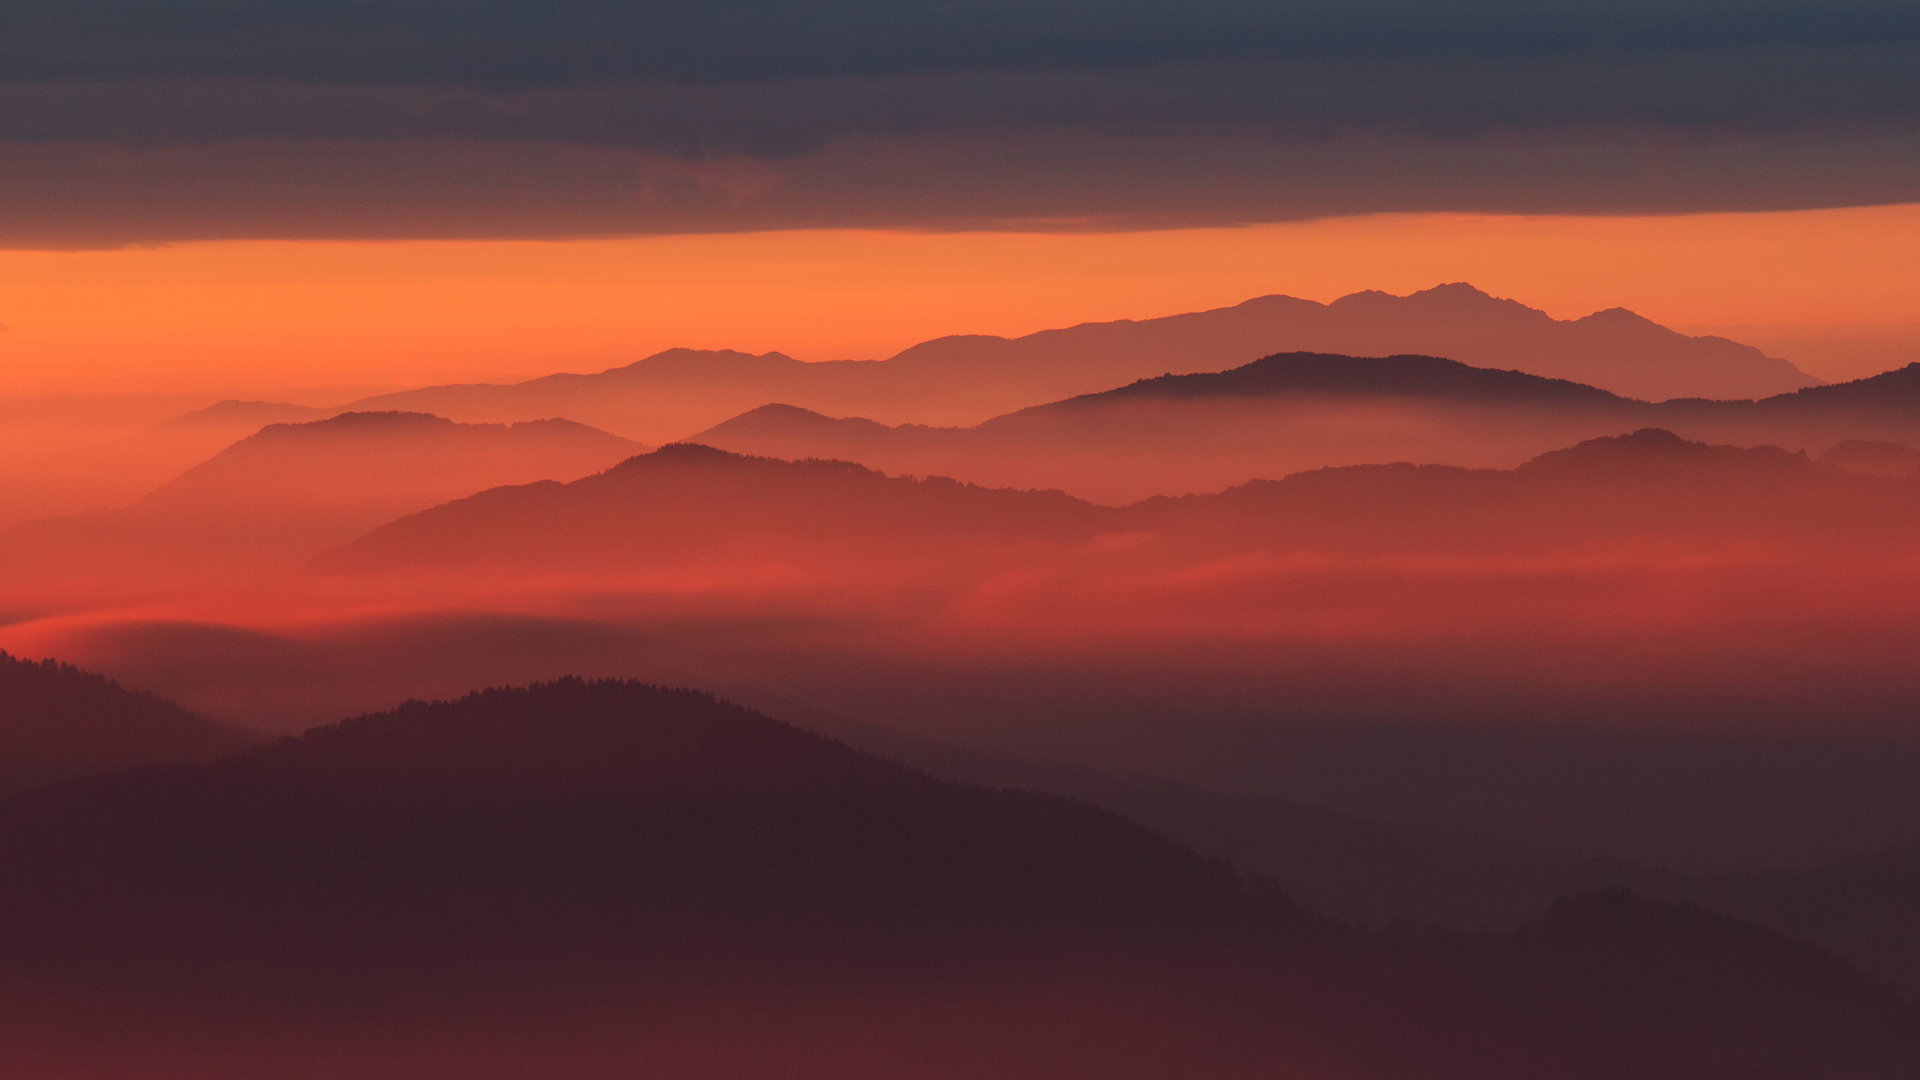 Гънките на Родопа планина от Tyuncher Eminov - tyunkata